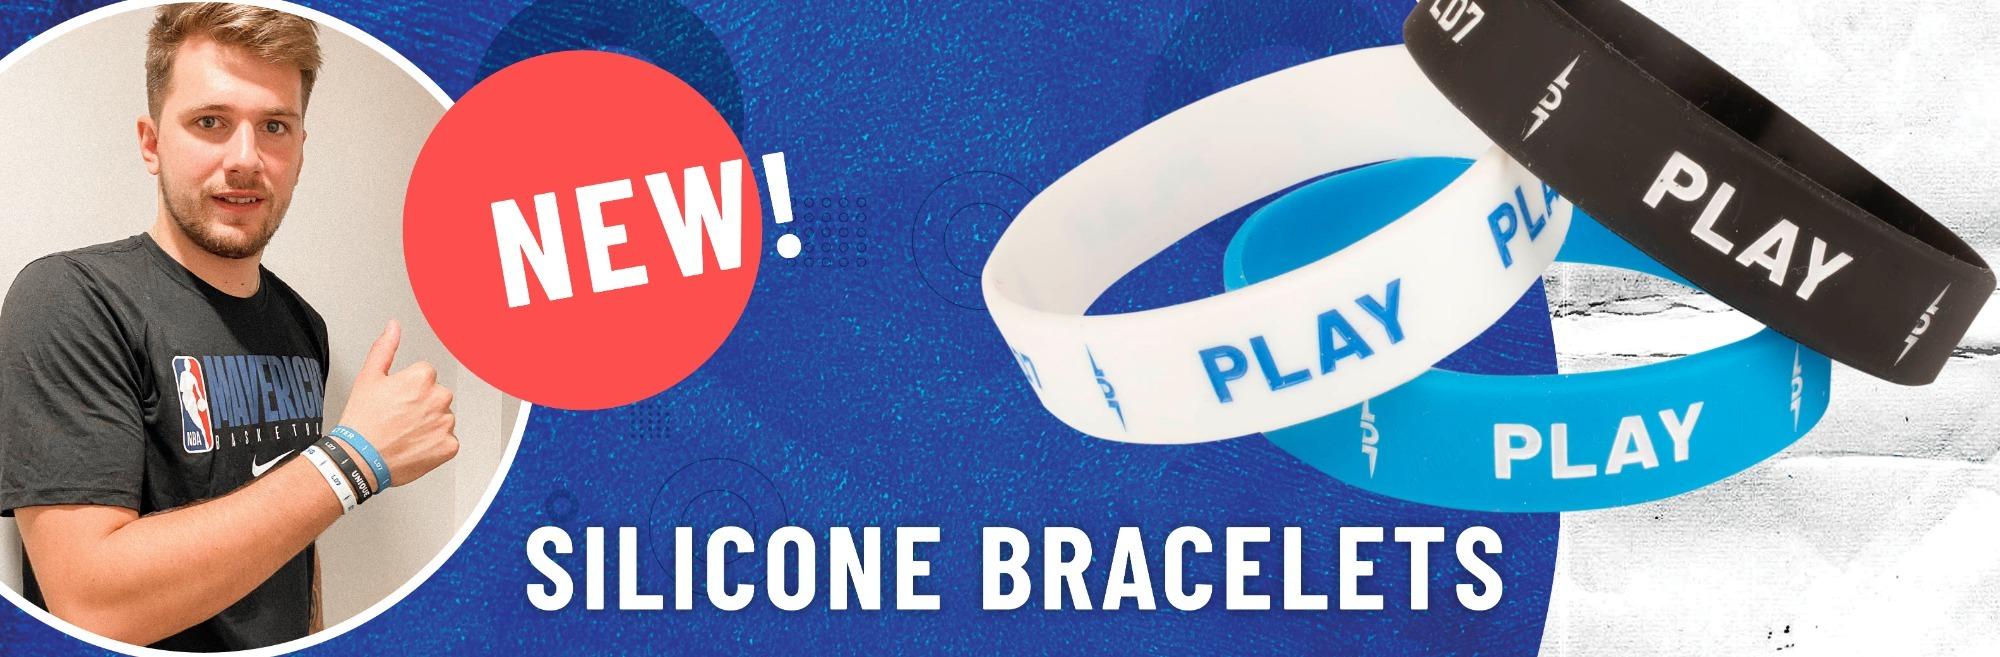 Silicon_bracelets2.jpg